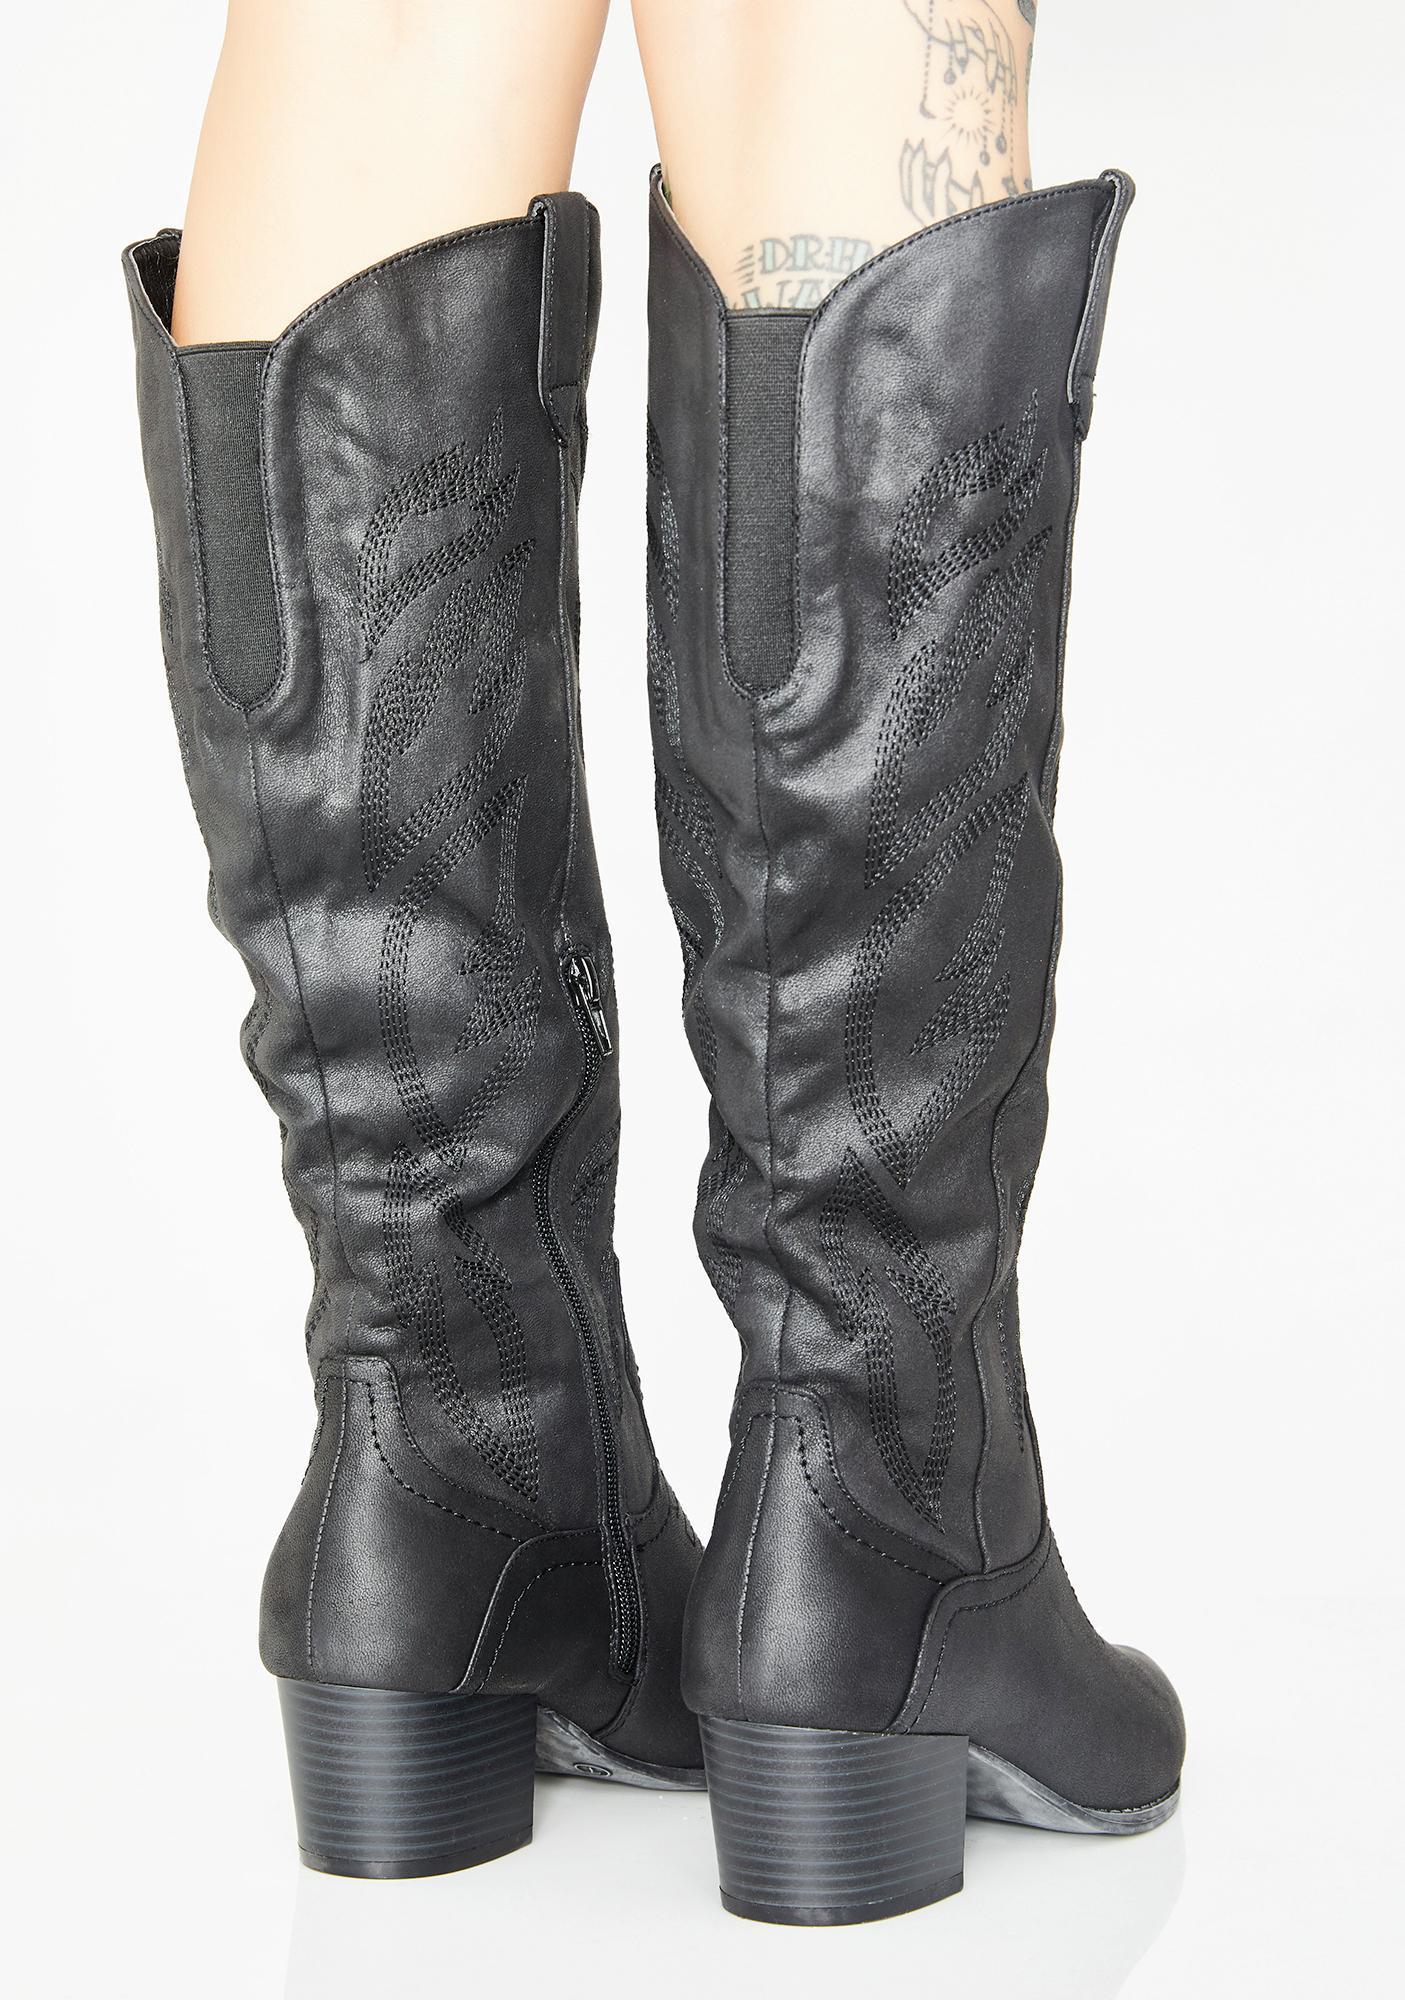 Lone Ranger Knee High Boots